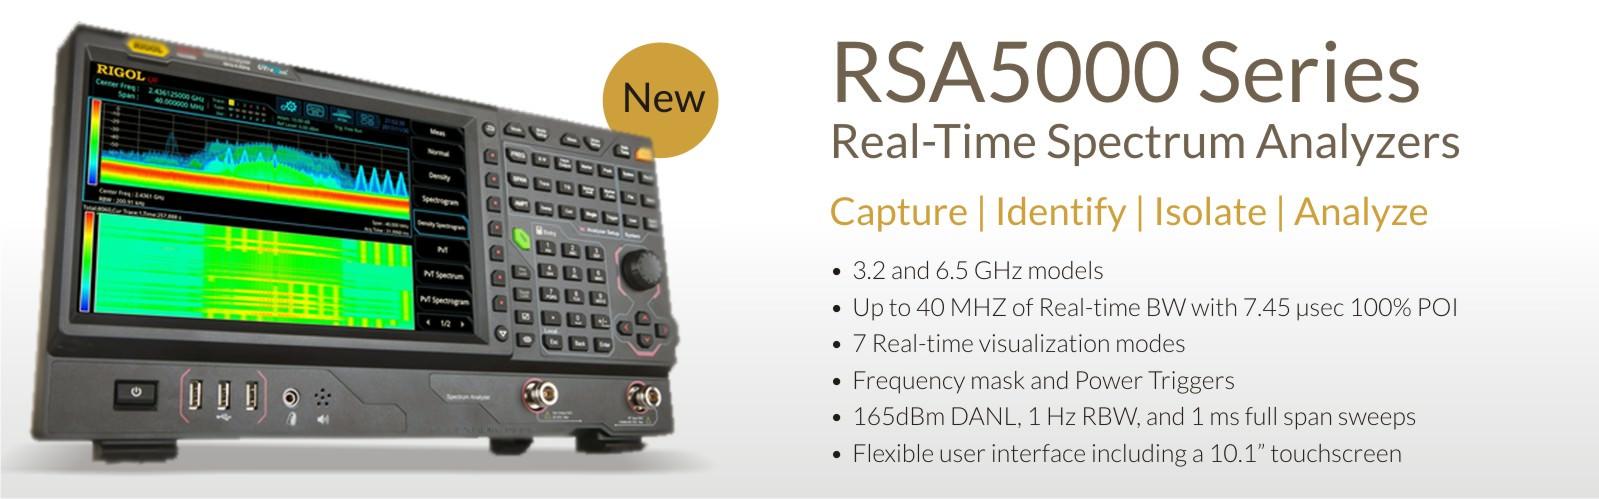 Real Time Spectrum Analyzer RSA 5000 Series